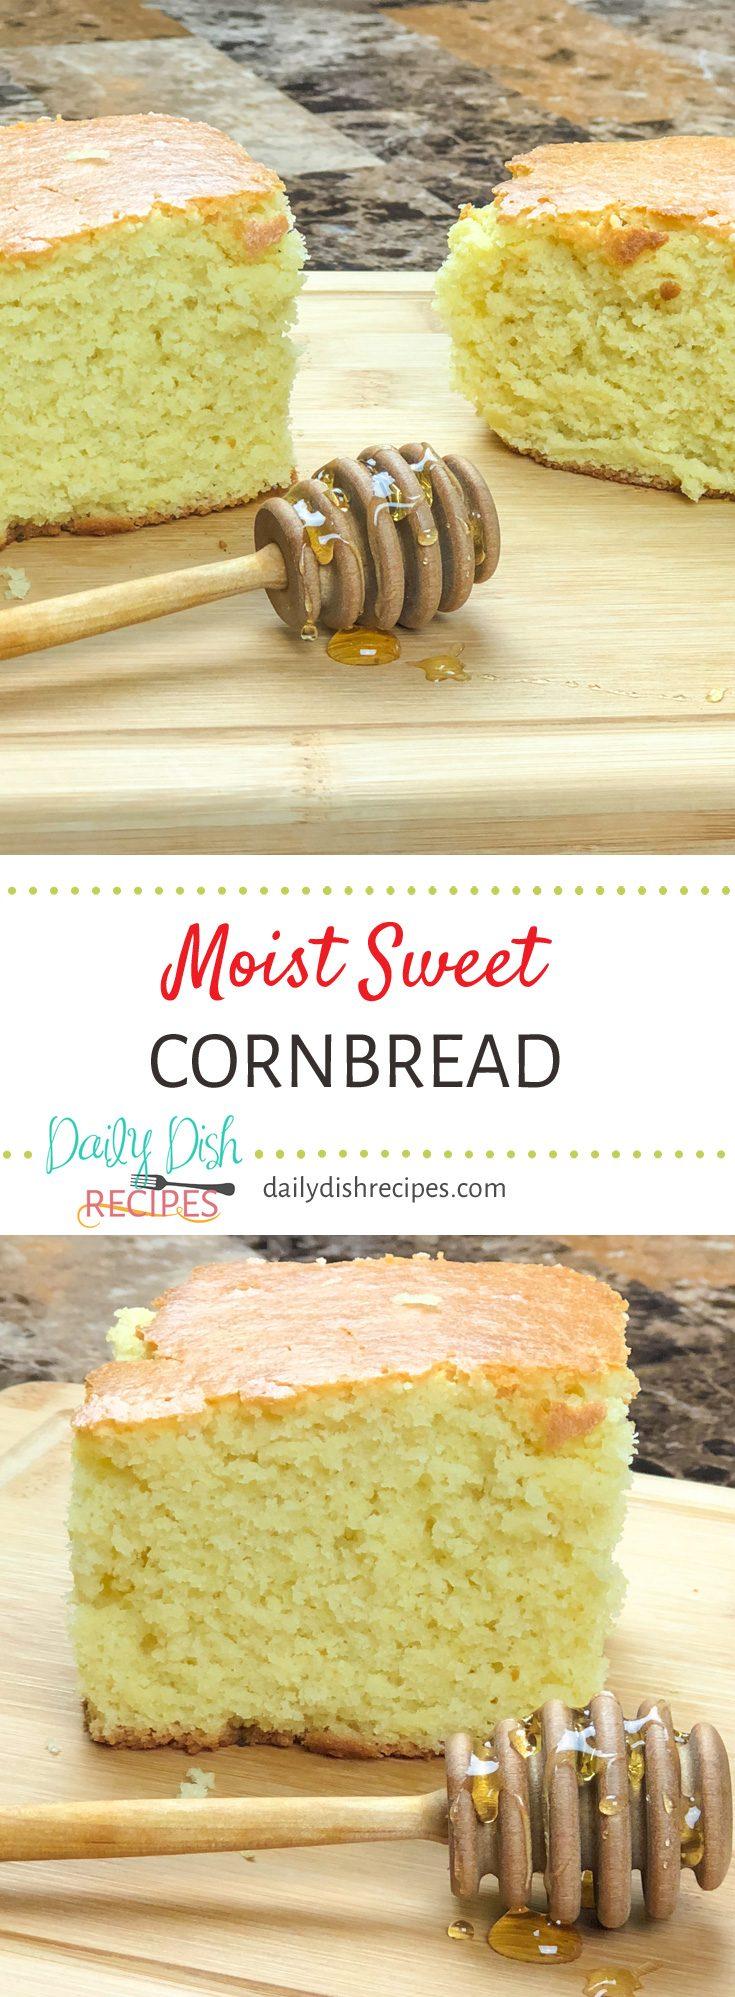 This award winning sweet cornbread recipe is full of moist sweet flavor. It really is the perfect cornbread!